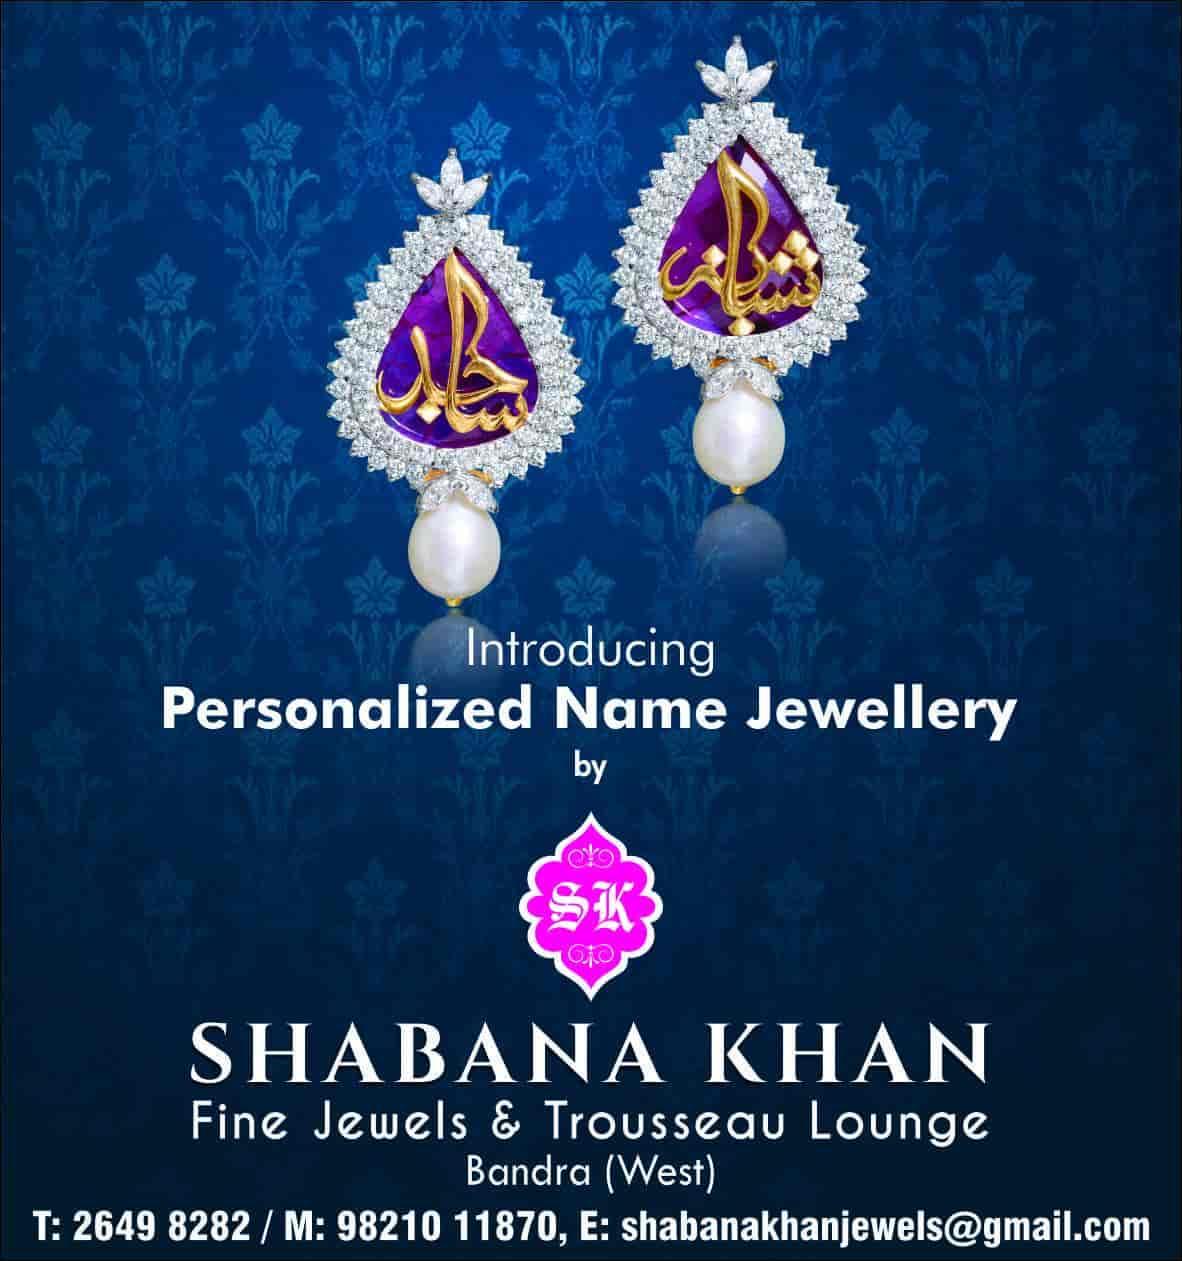 shaban khan name